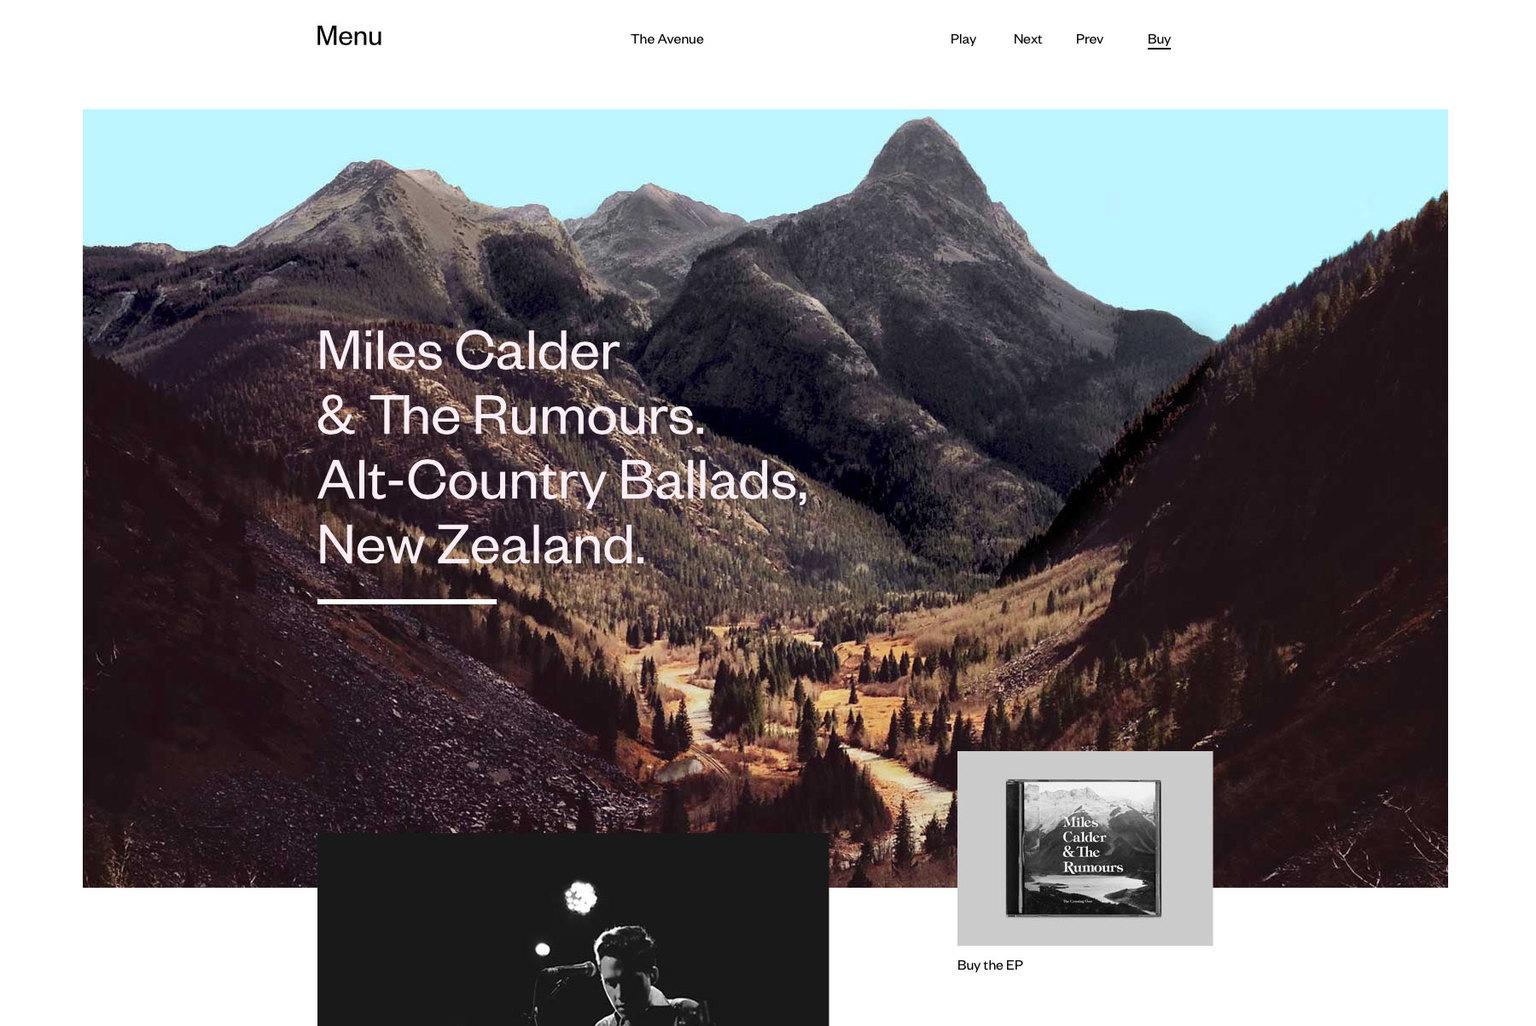 Vllg klim foundersgrotesk milescalder